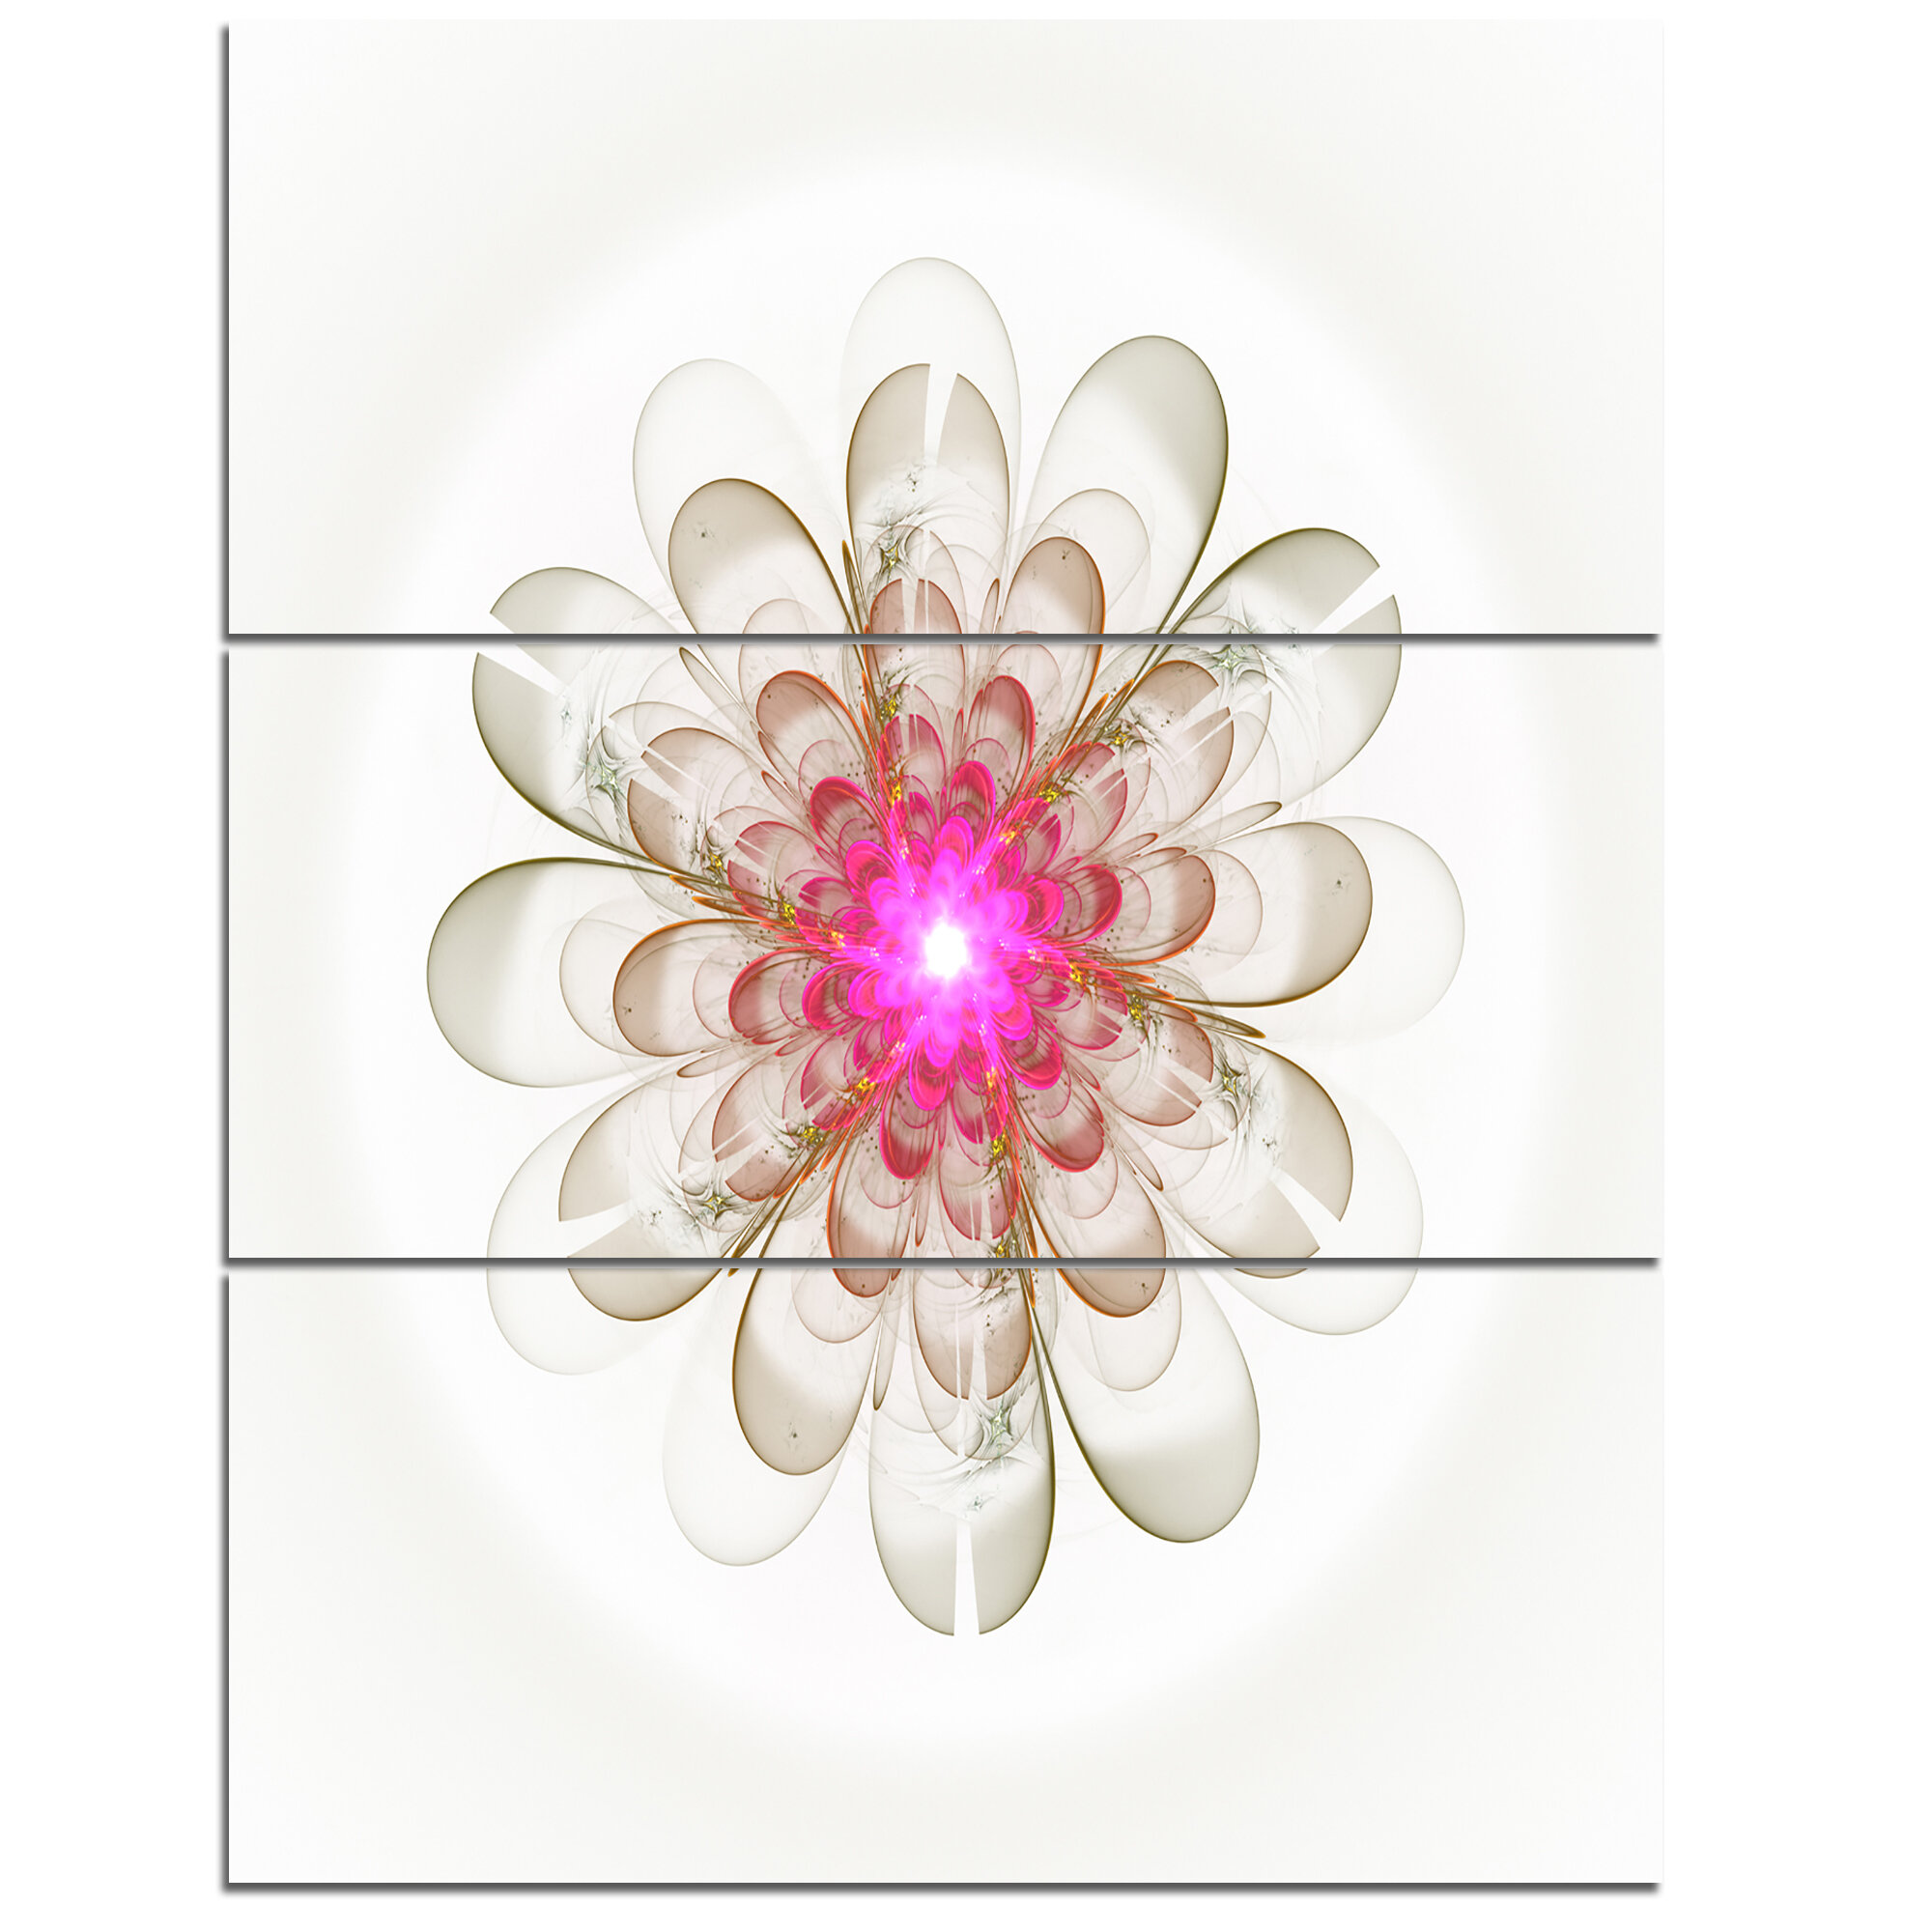 Designart Simple White Pink Fractal Flower Art 3 Piece Graphic Art On Wrapped Canvas Set Wayfair